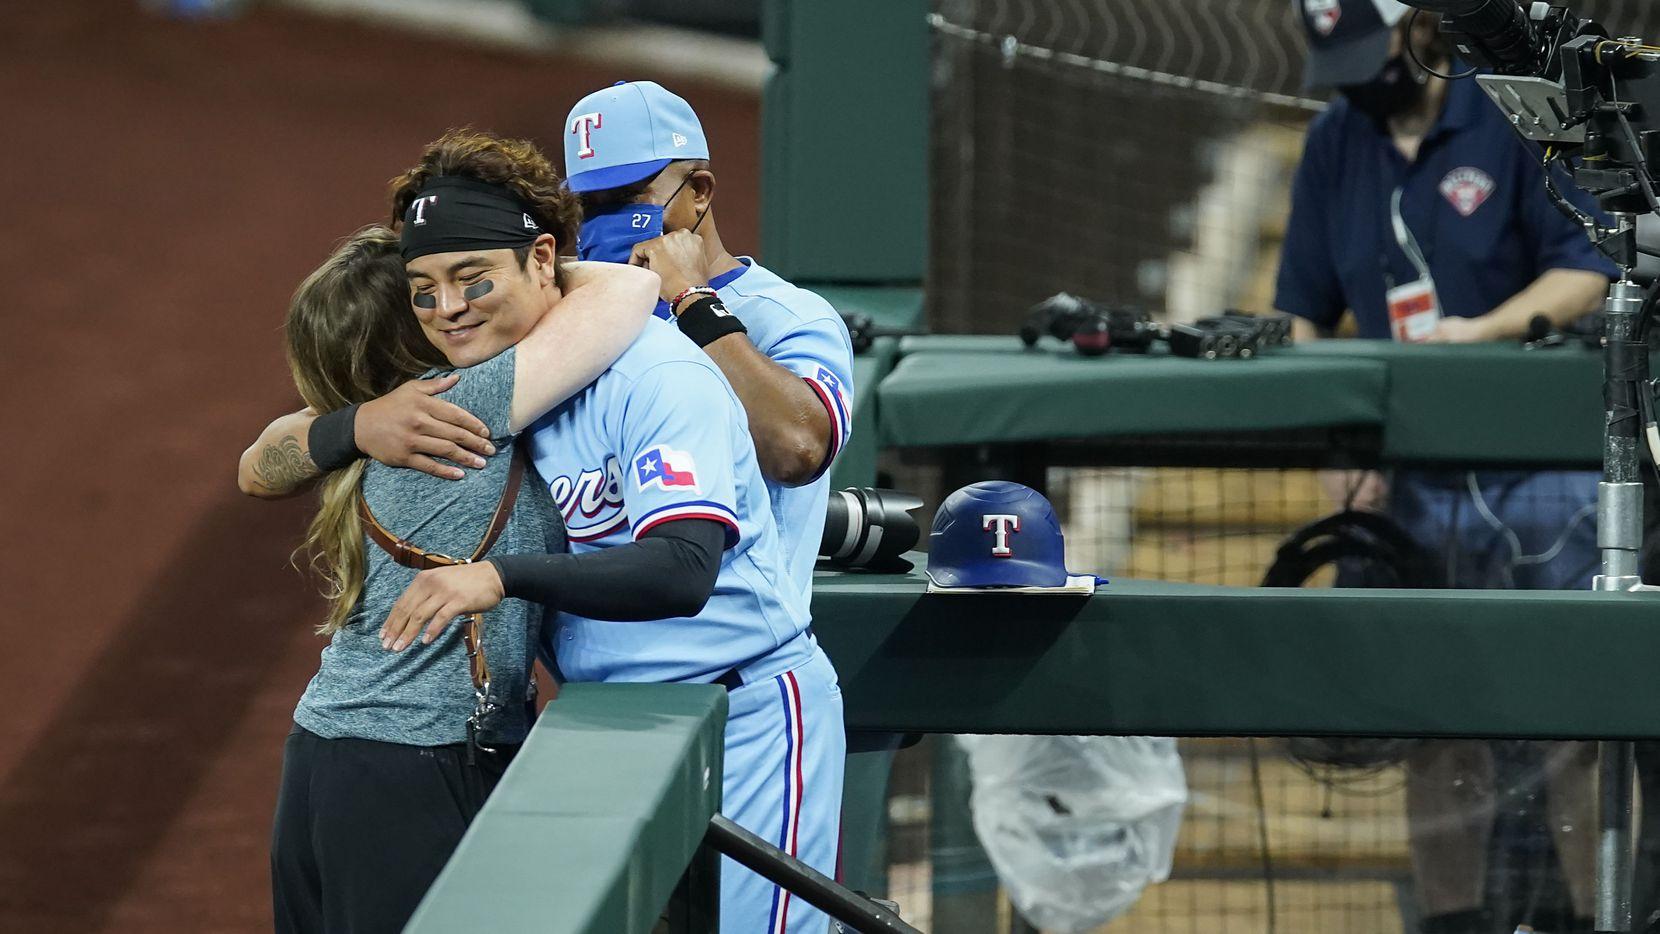 Rangers outfielder/designated hitter Shin-Soo Choo hugs team photographer Kelly Gavin as third base coach Tony Beasley looks on following an 8-4 win over the Astros in the Rangers' season finale at Globe Life Field on Sunday, Sept. 27, 2020.